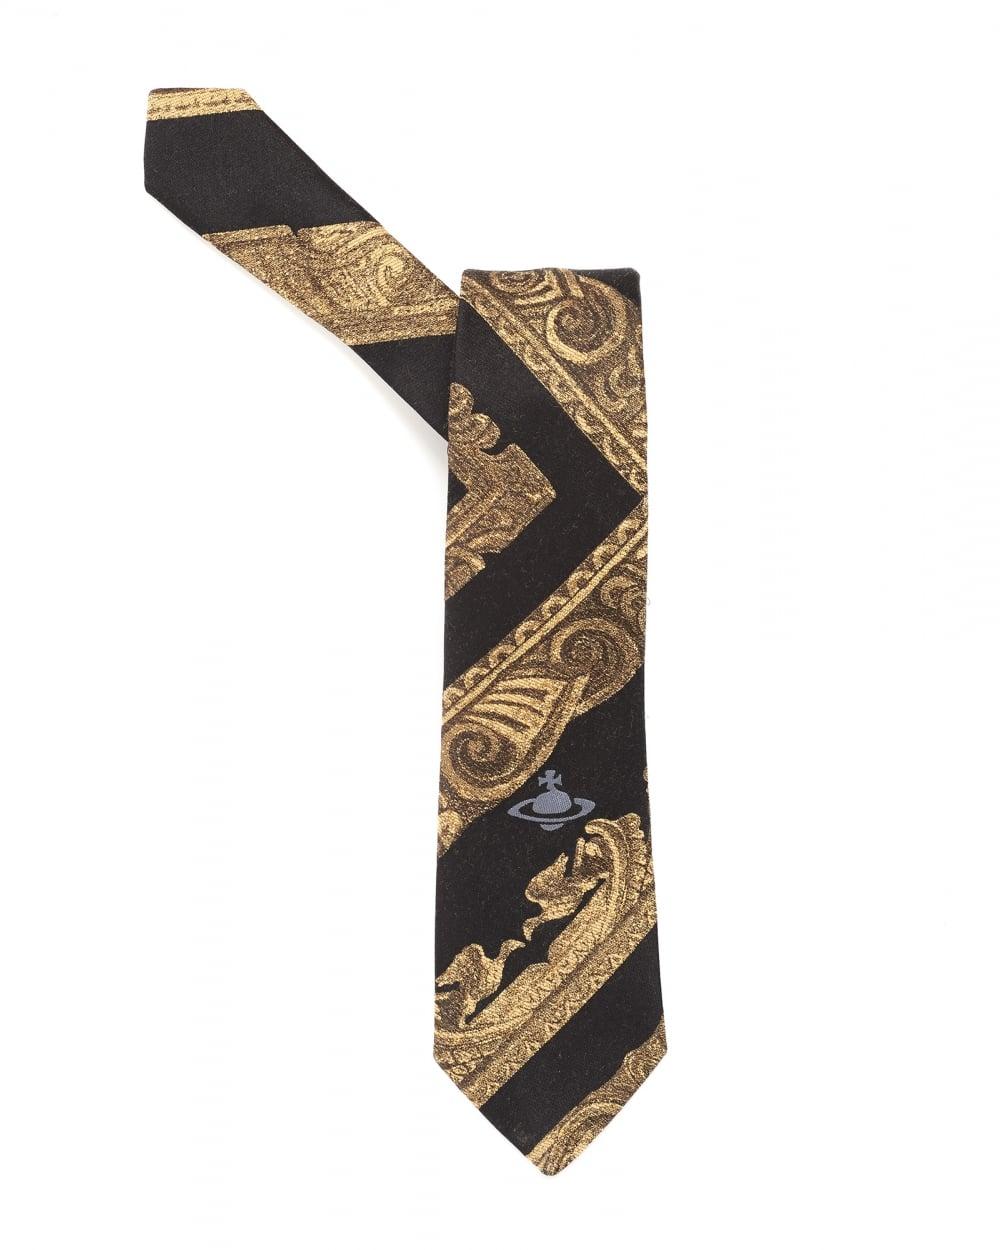 Mens Tie, Charcoal Grey Frame Tie